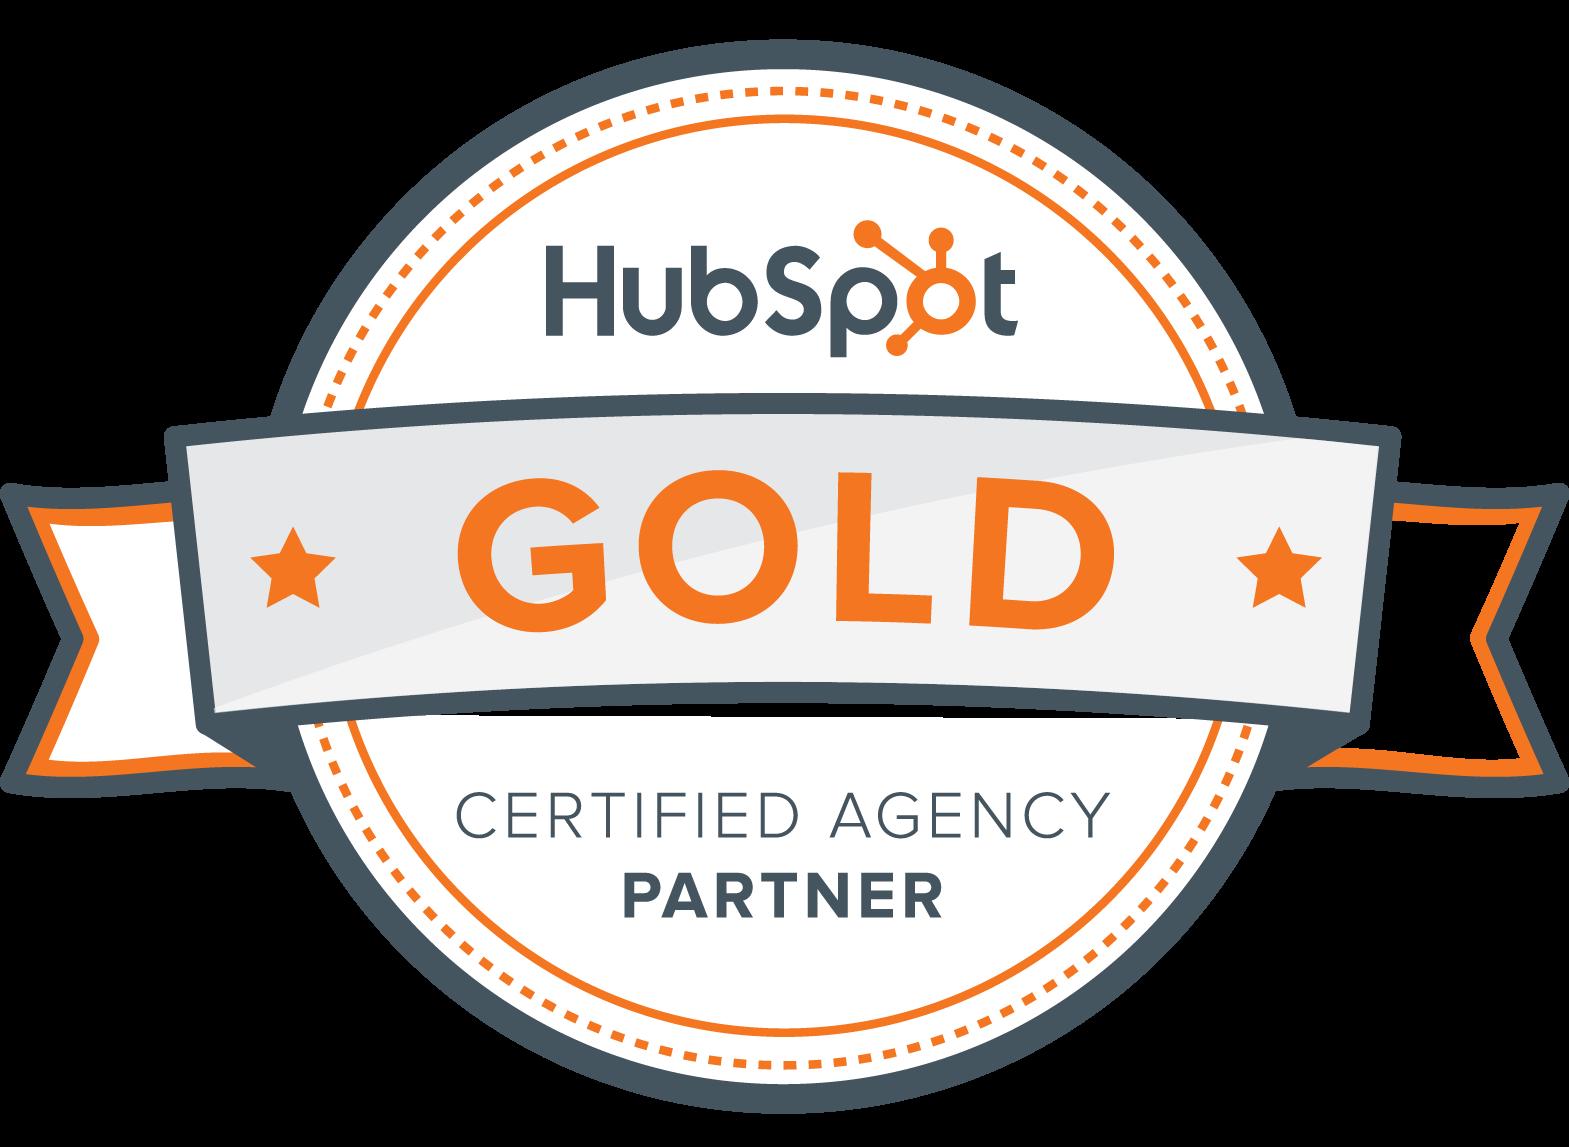 HubSpot Partner in Cincinnati analytics that profit